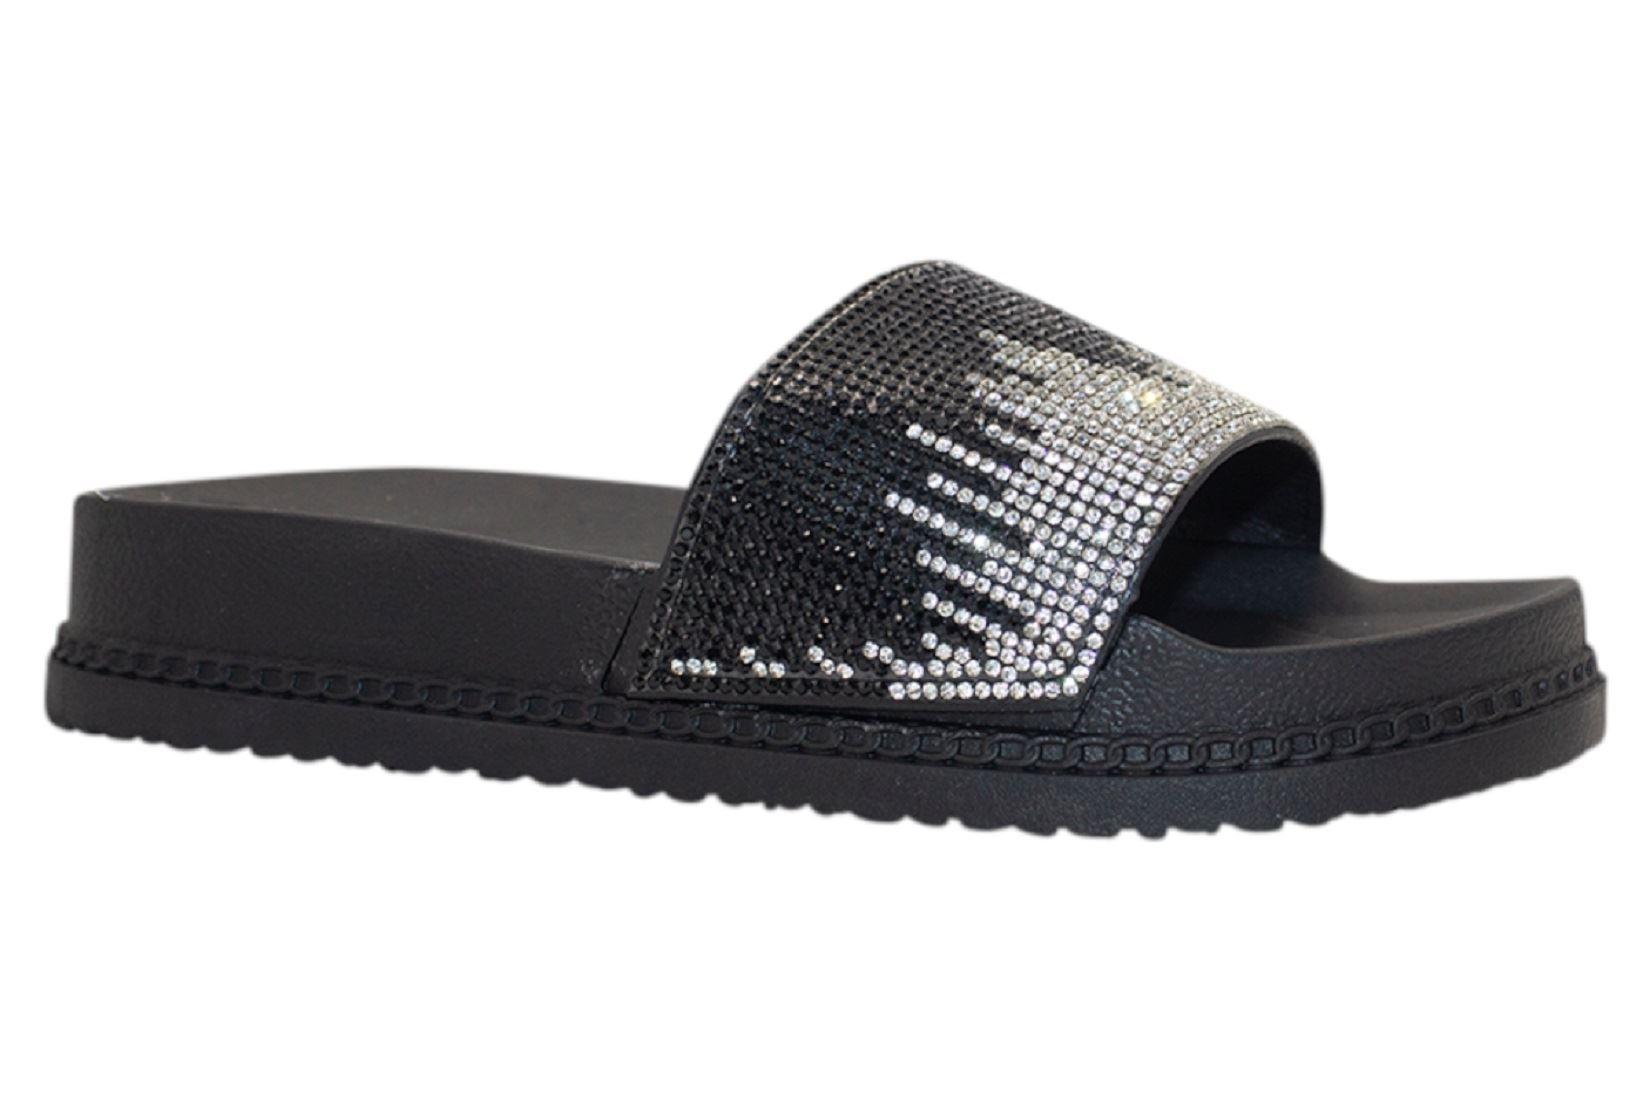 Womens-Sliders-Casual-Slippers-Mules-Ladies-Diamante-Flip-Flop-Sandals-Shoes thumbnail 98